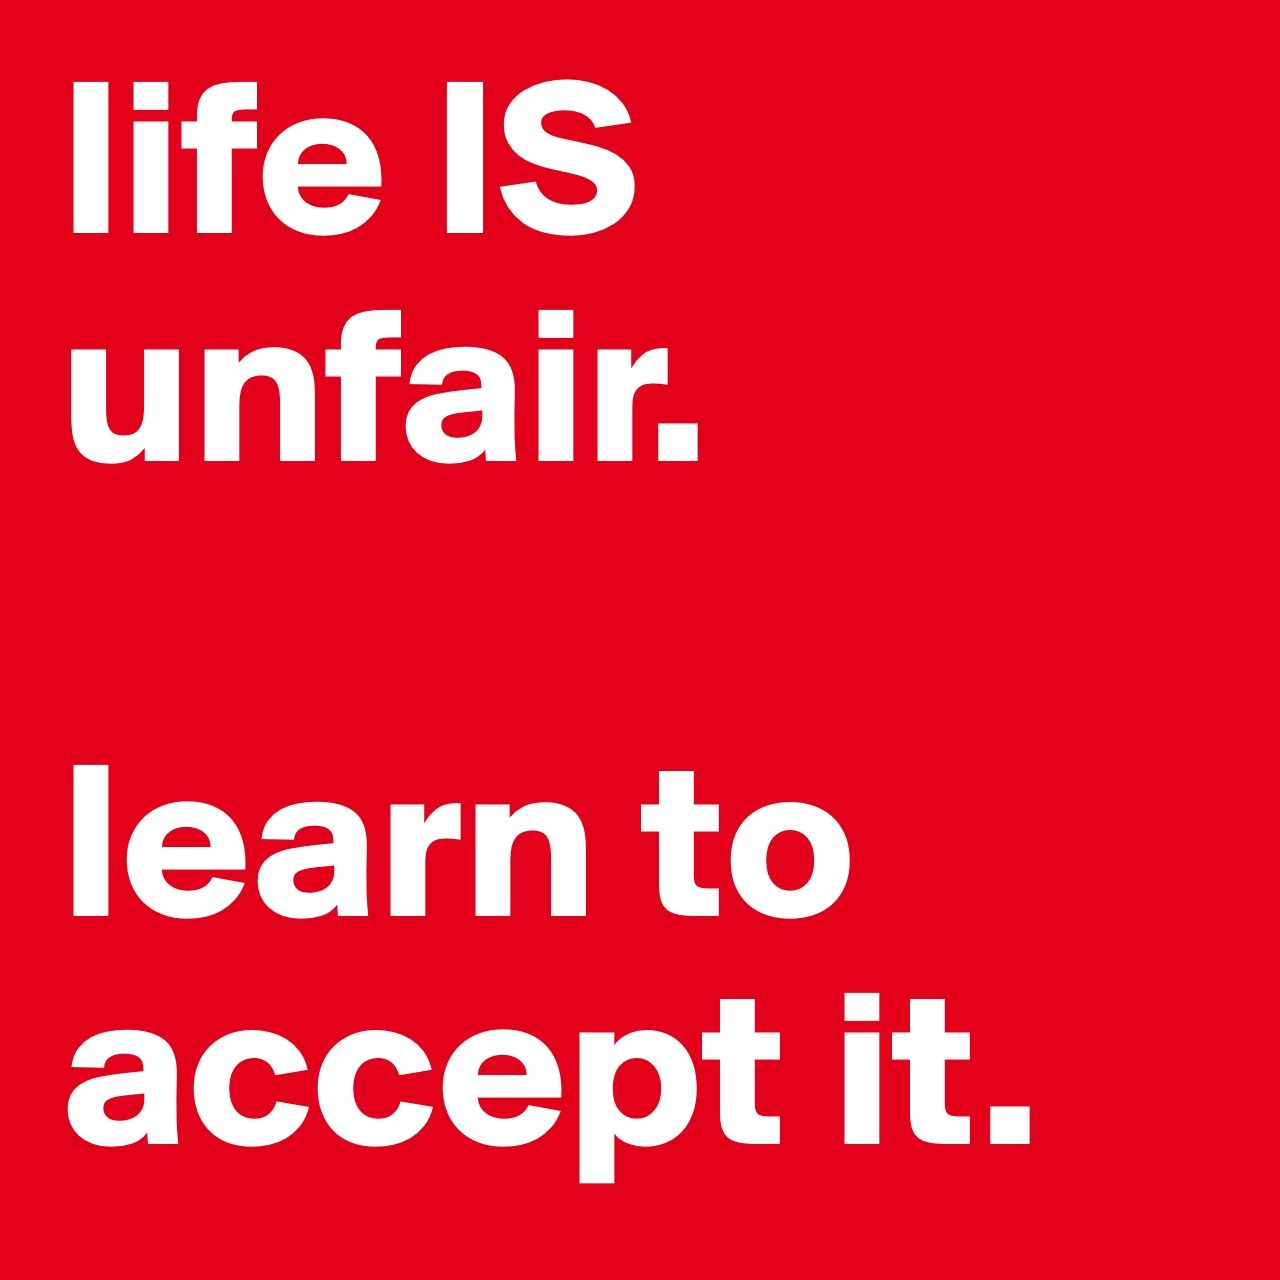 Life IS UNFAIR. #palaisipan